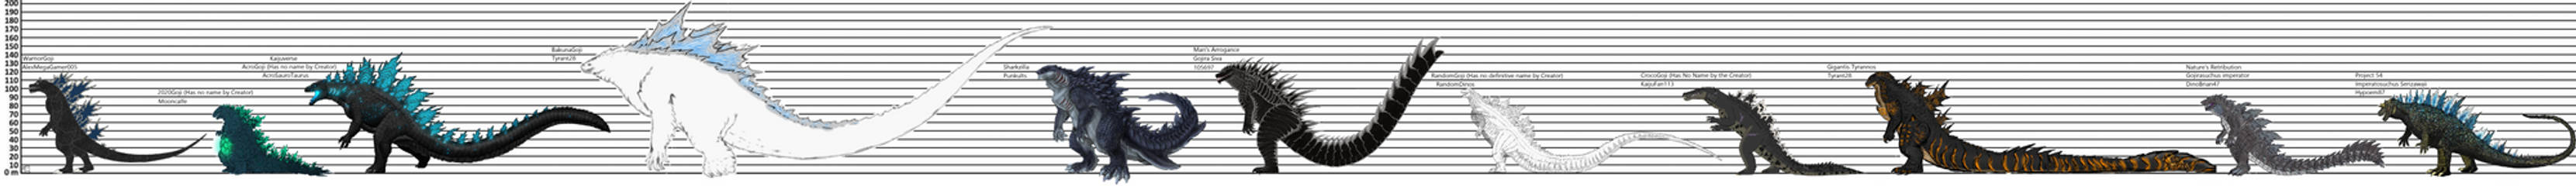 Godzillas Size Comparison